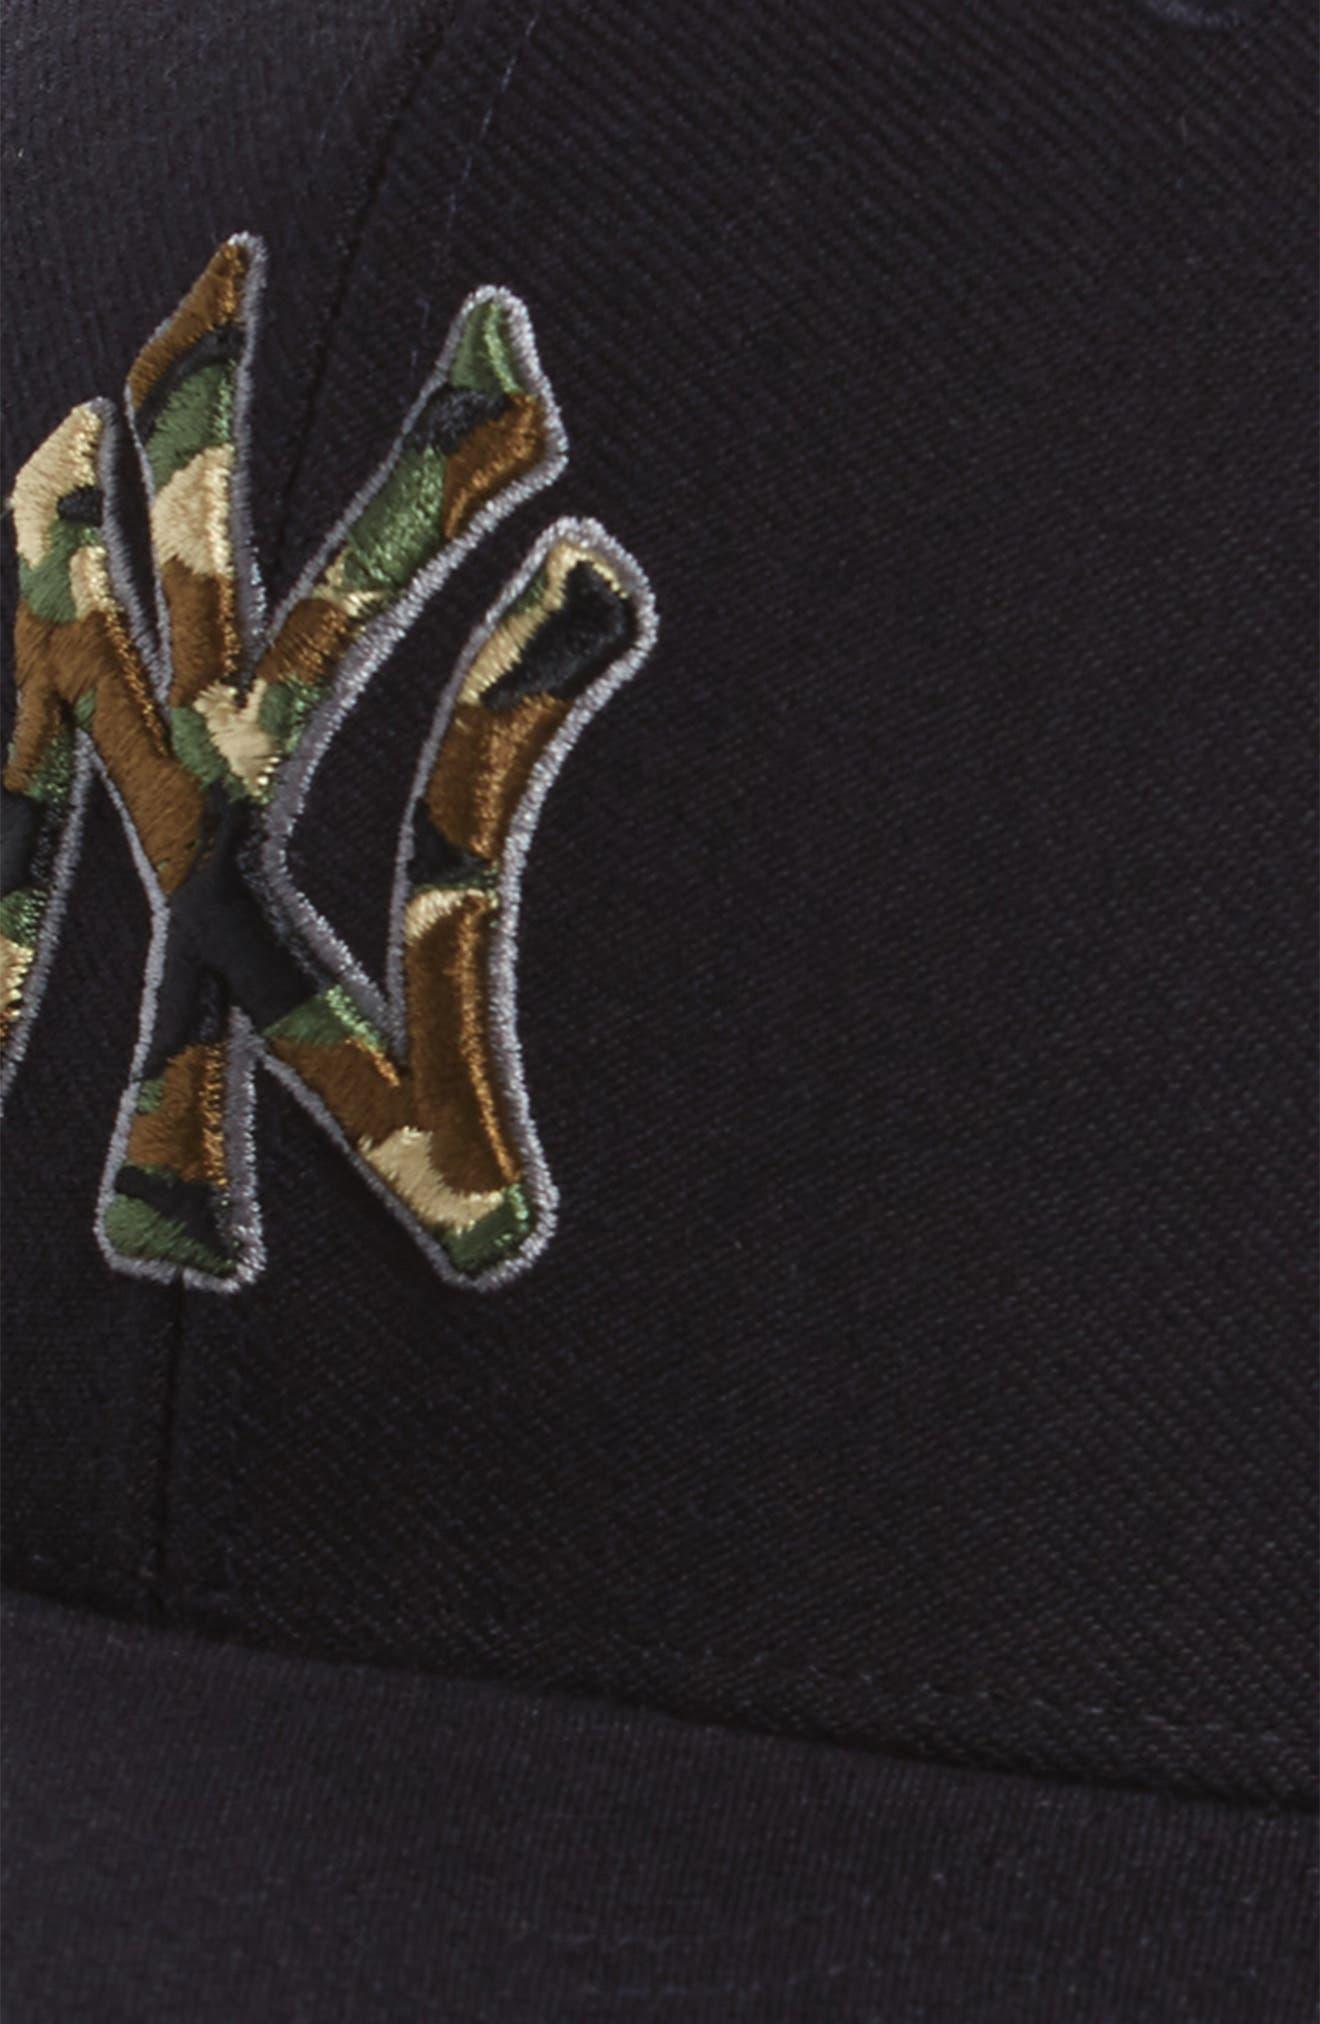 Camfill New York Yankees Baseball Cap,                             Alternate thumbnail 3, color,                             Navy